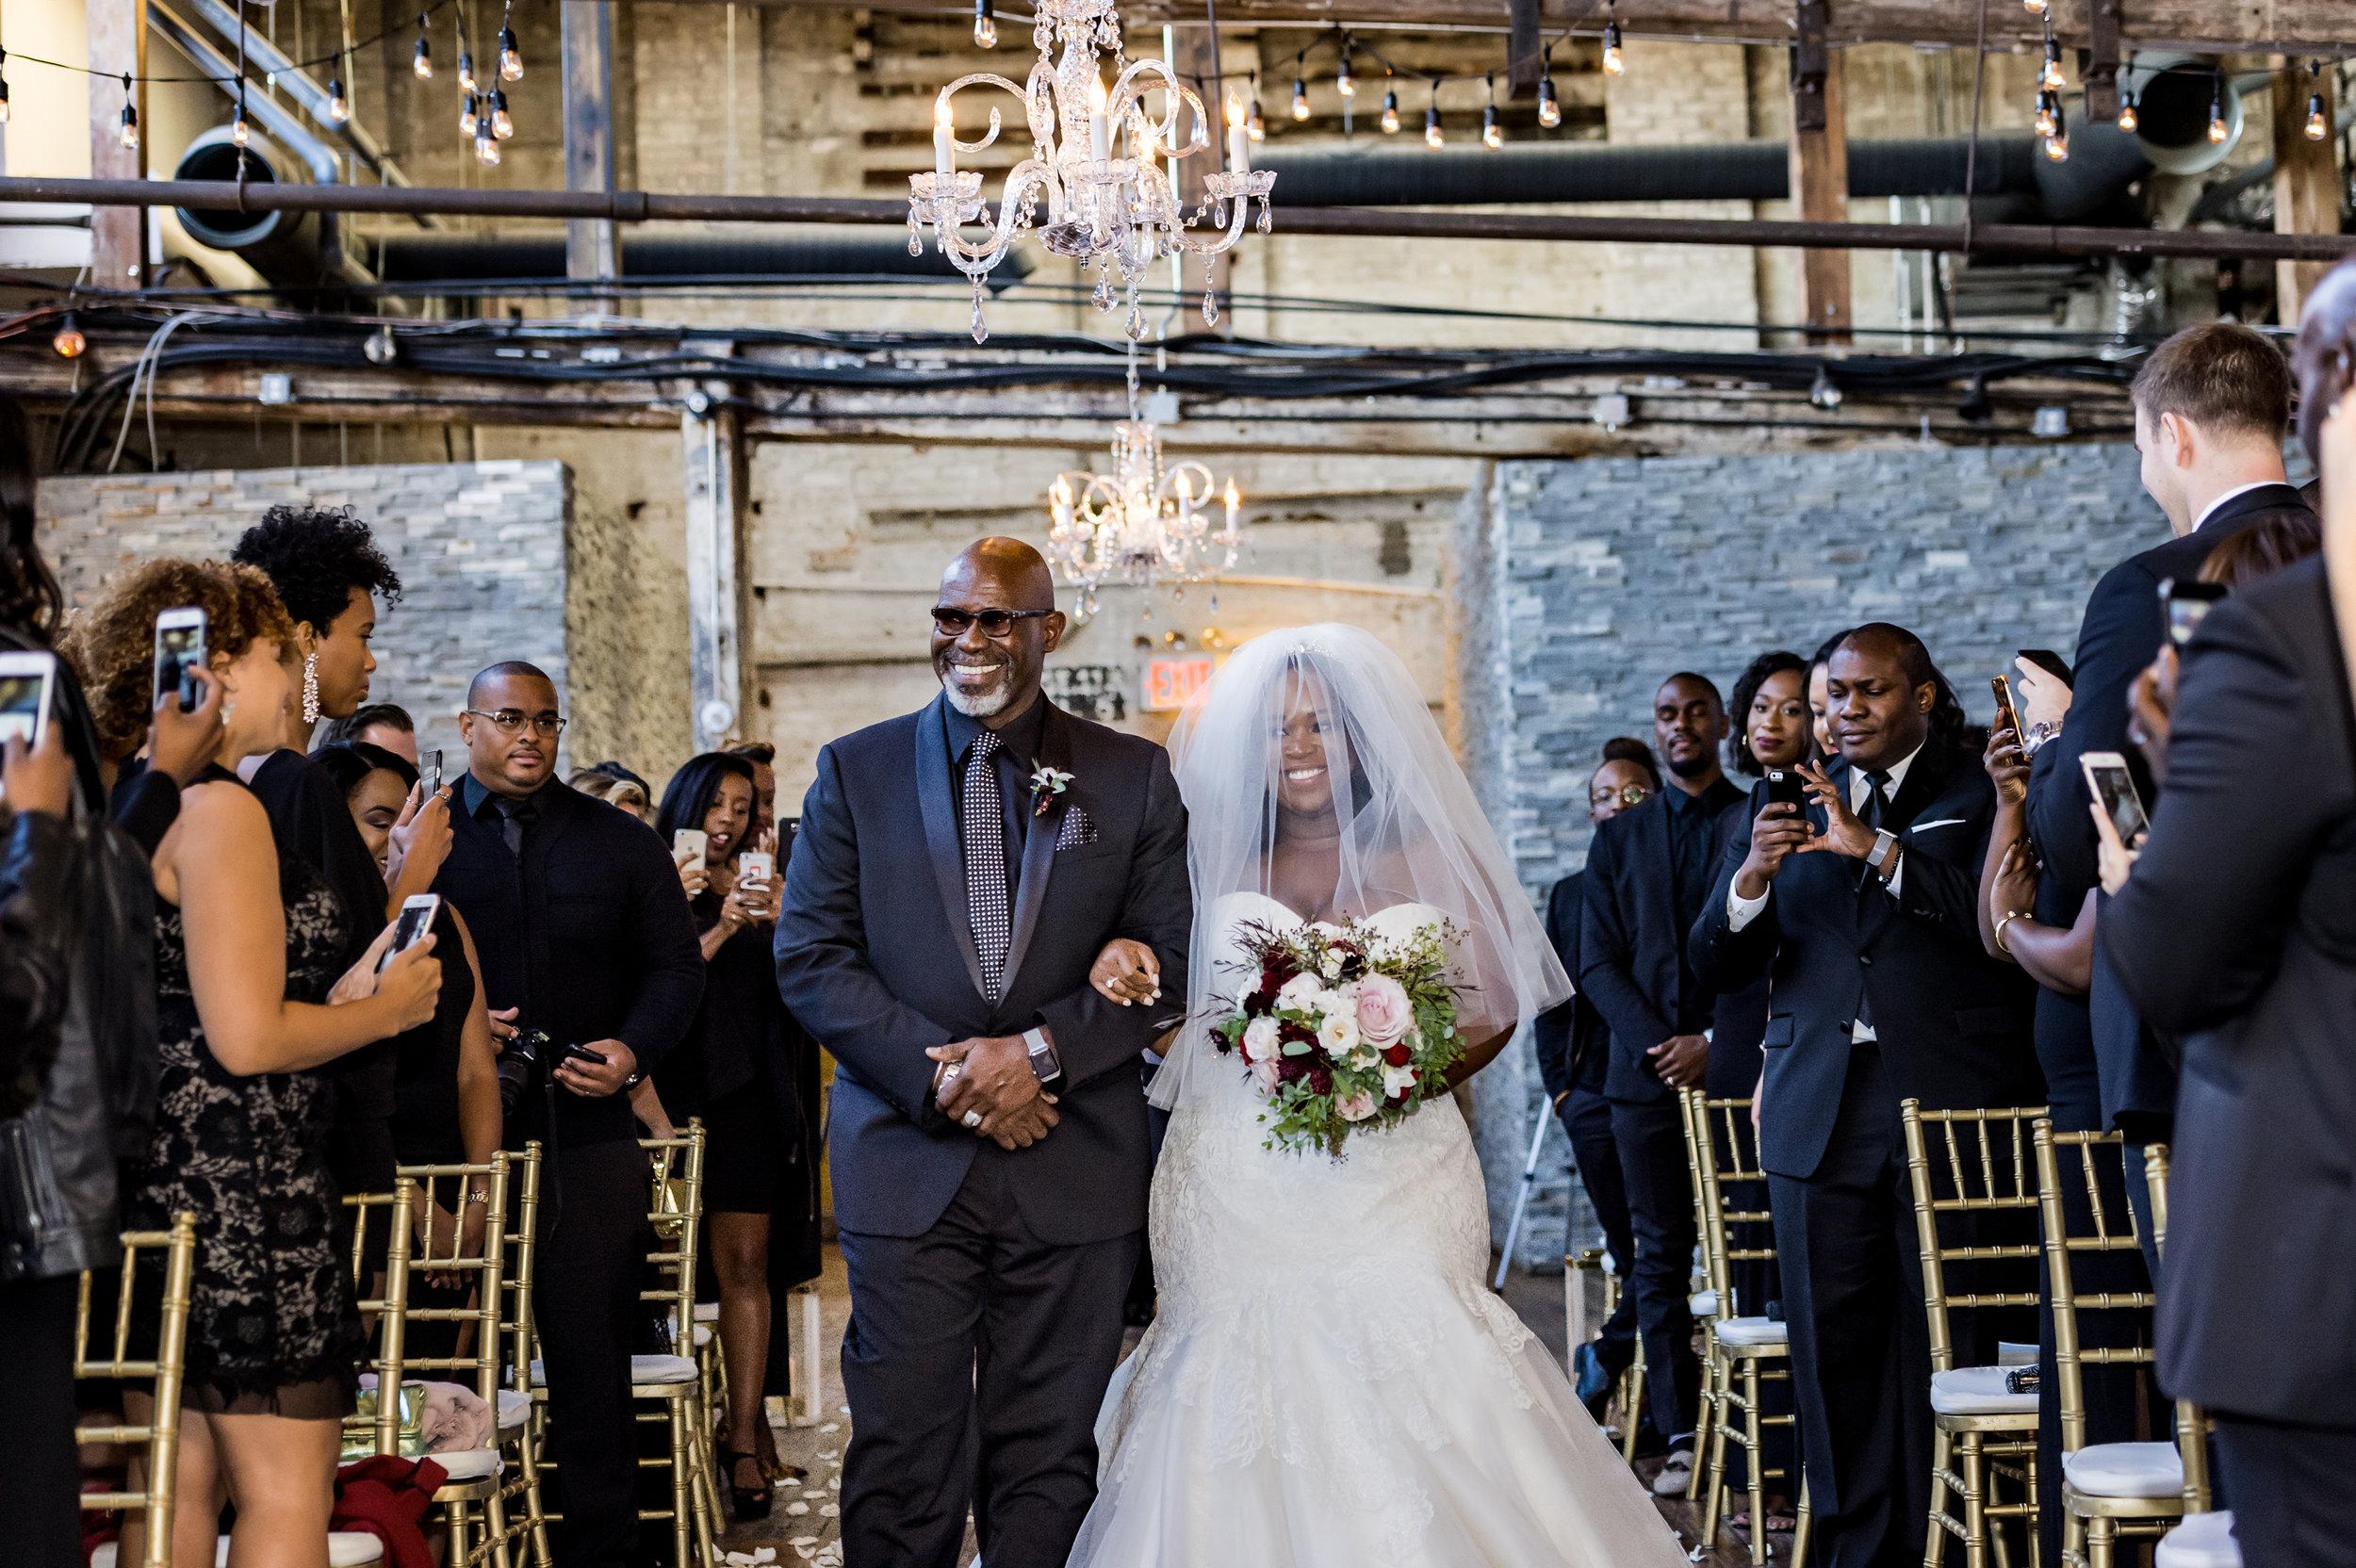 victorious-events-nyc-030-yanique-rondel-greenpoint-loft-wedding-amy-anaiz.jpg